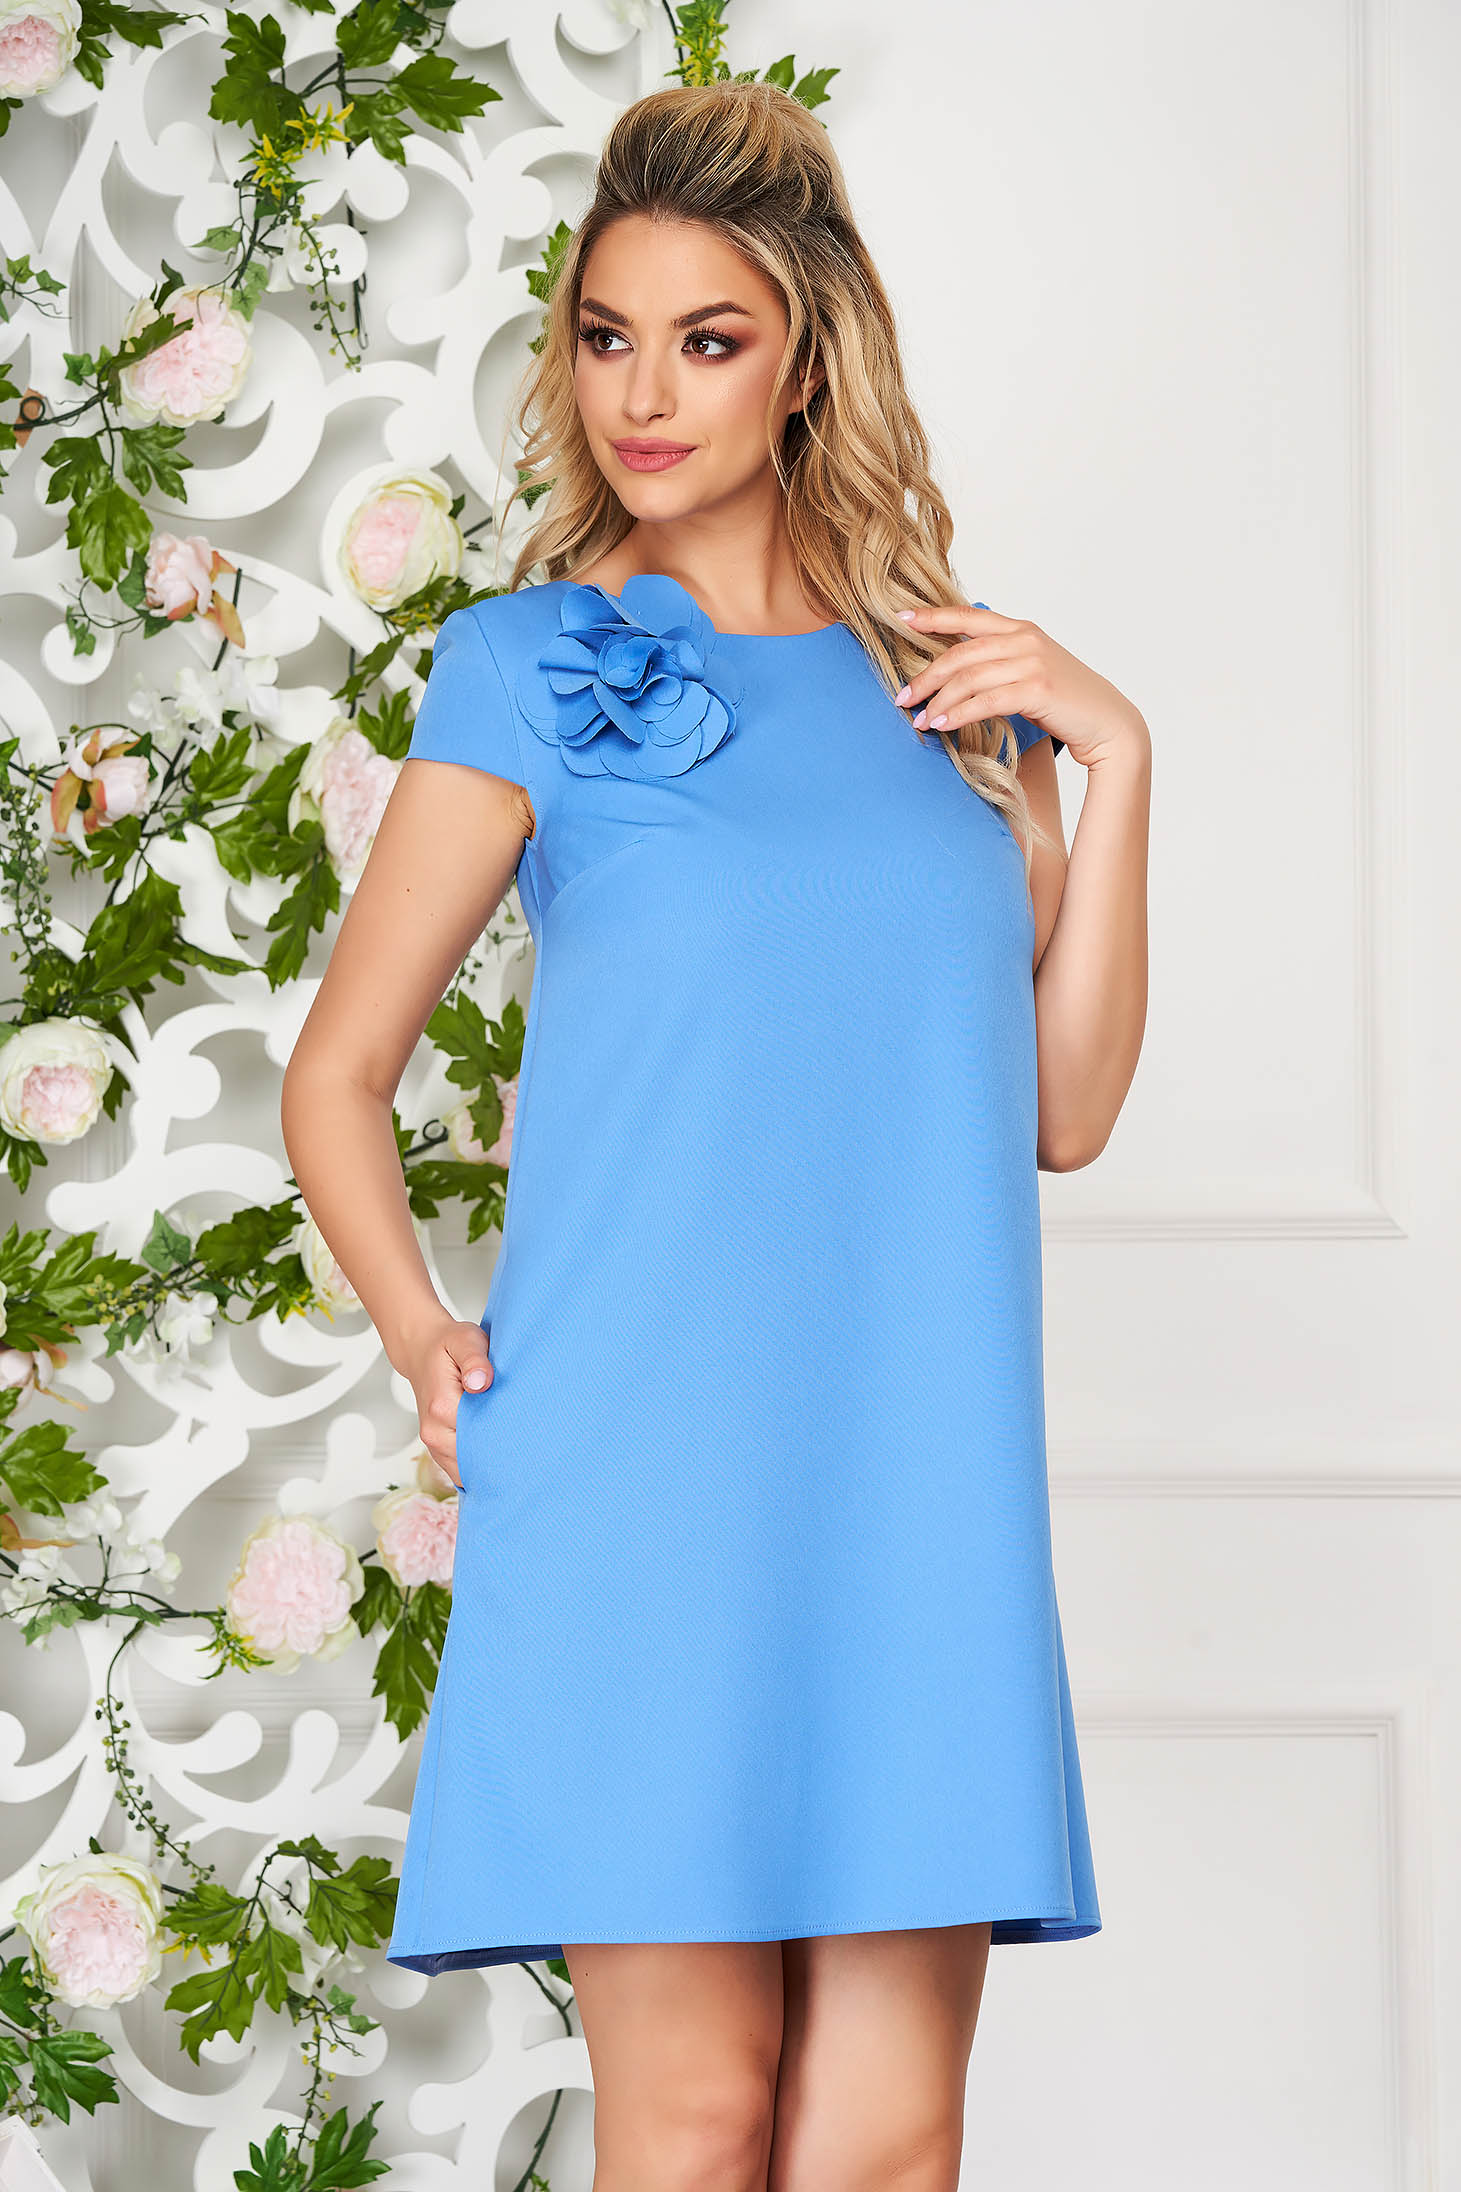 Rochie StarShinerS albastru-deschis scurta de zi cu croi larg din stofa elastica cu buzunare